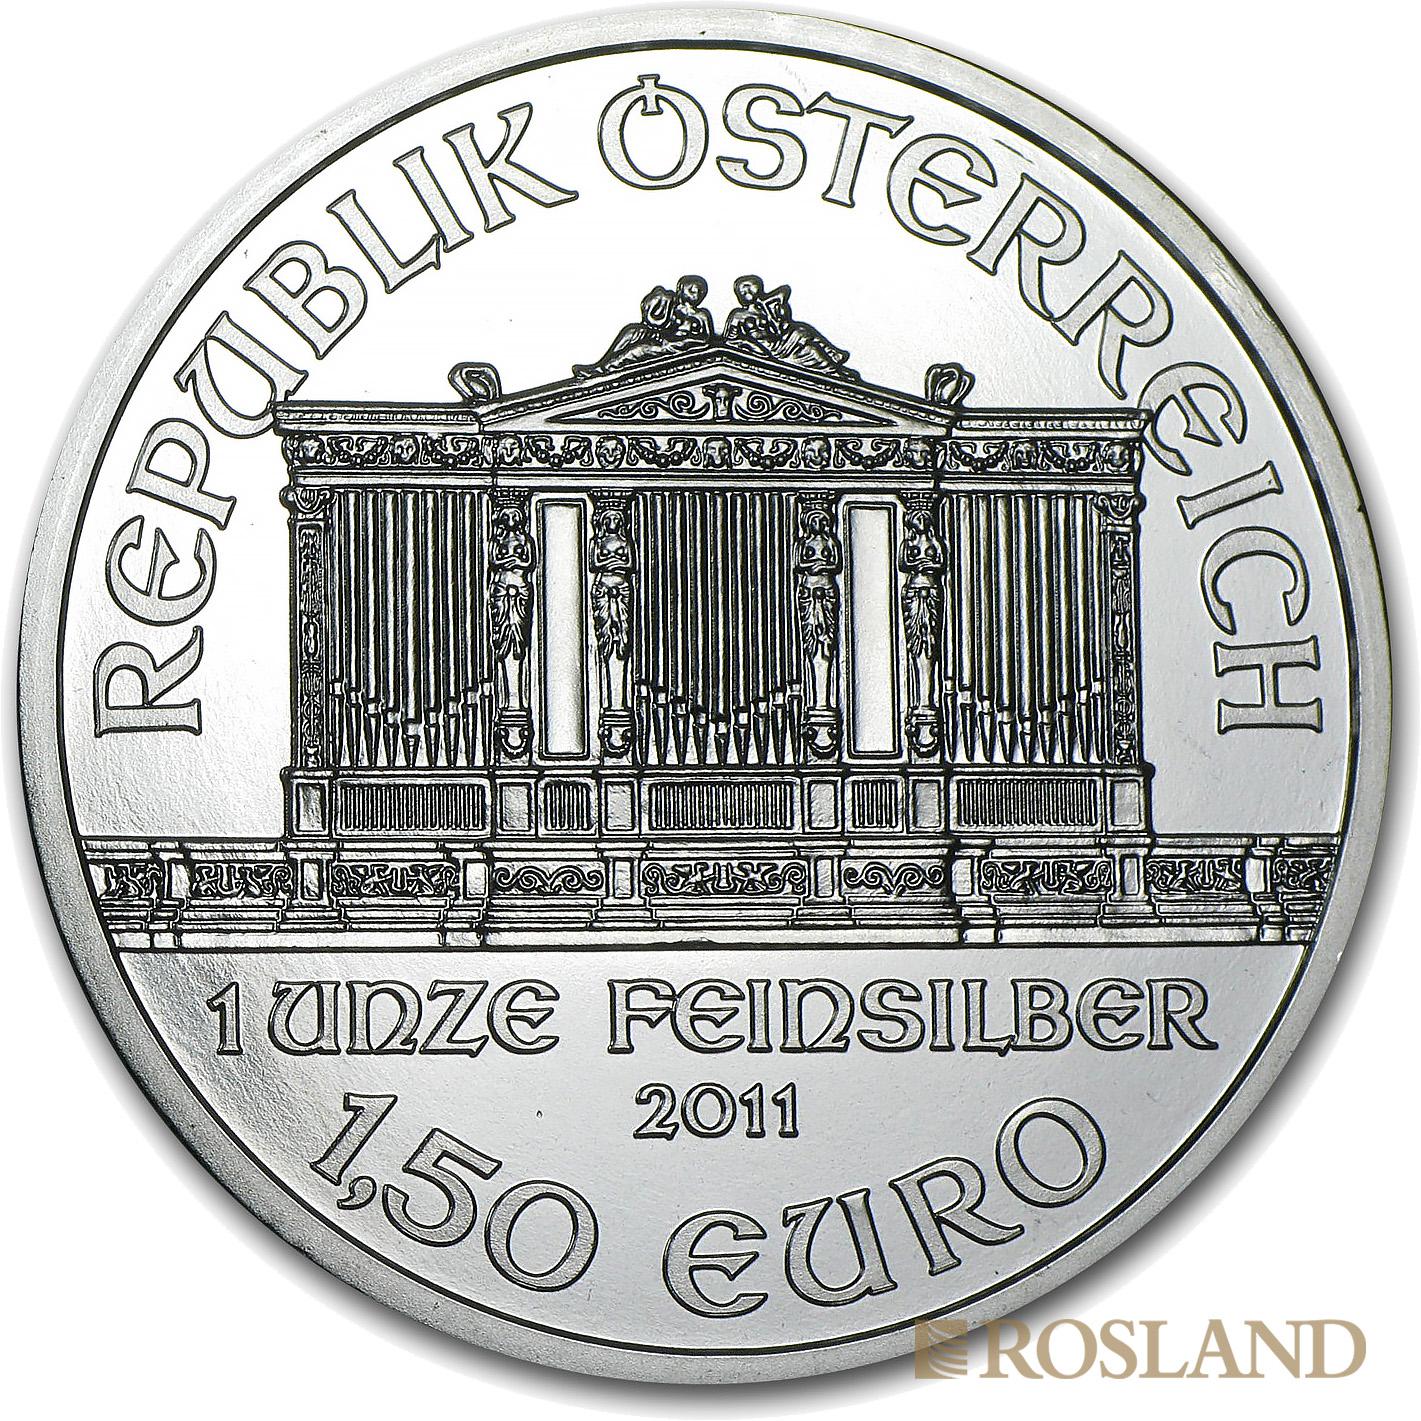 1 Unze Silbermünze Wiener Philharmoniker 2011